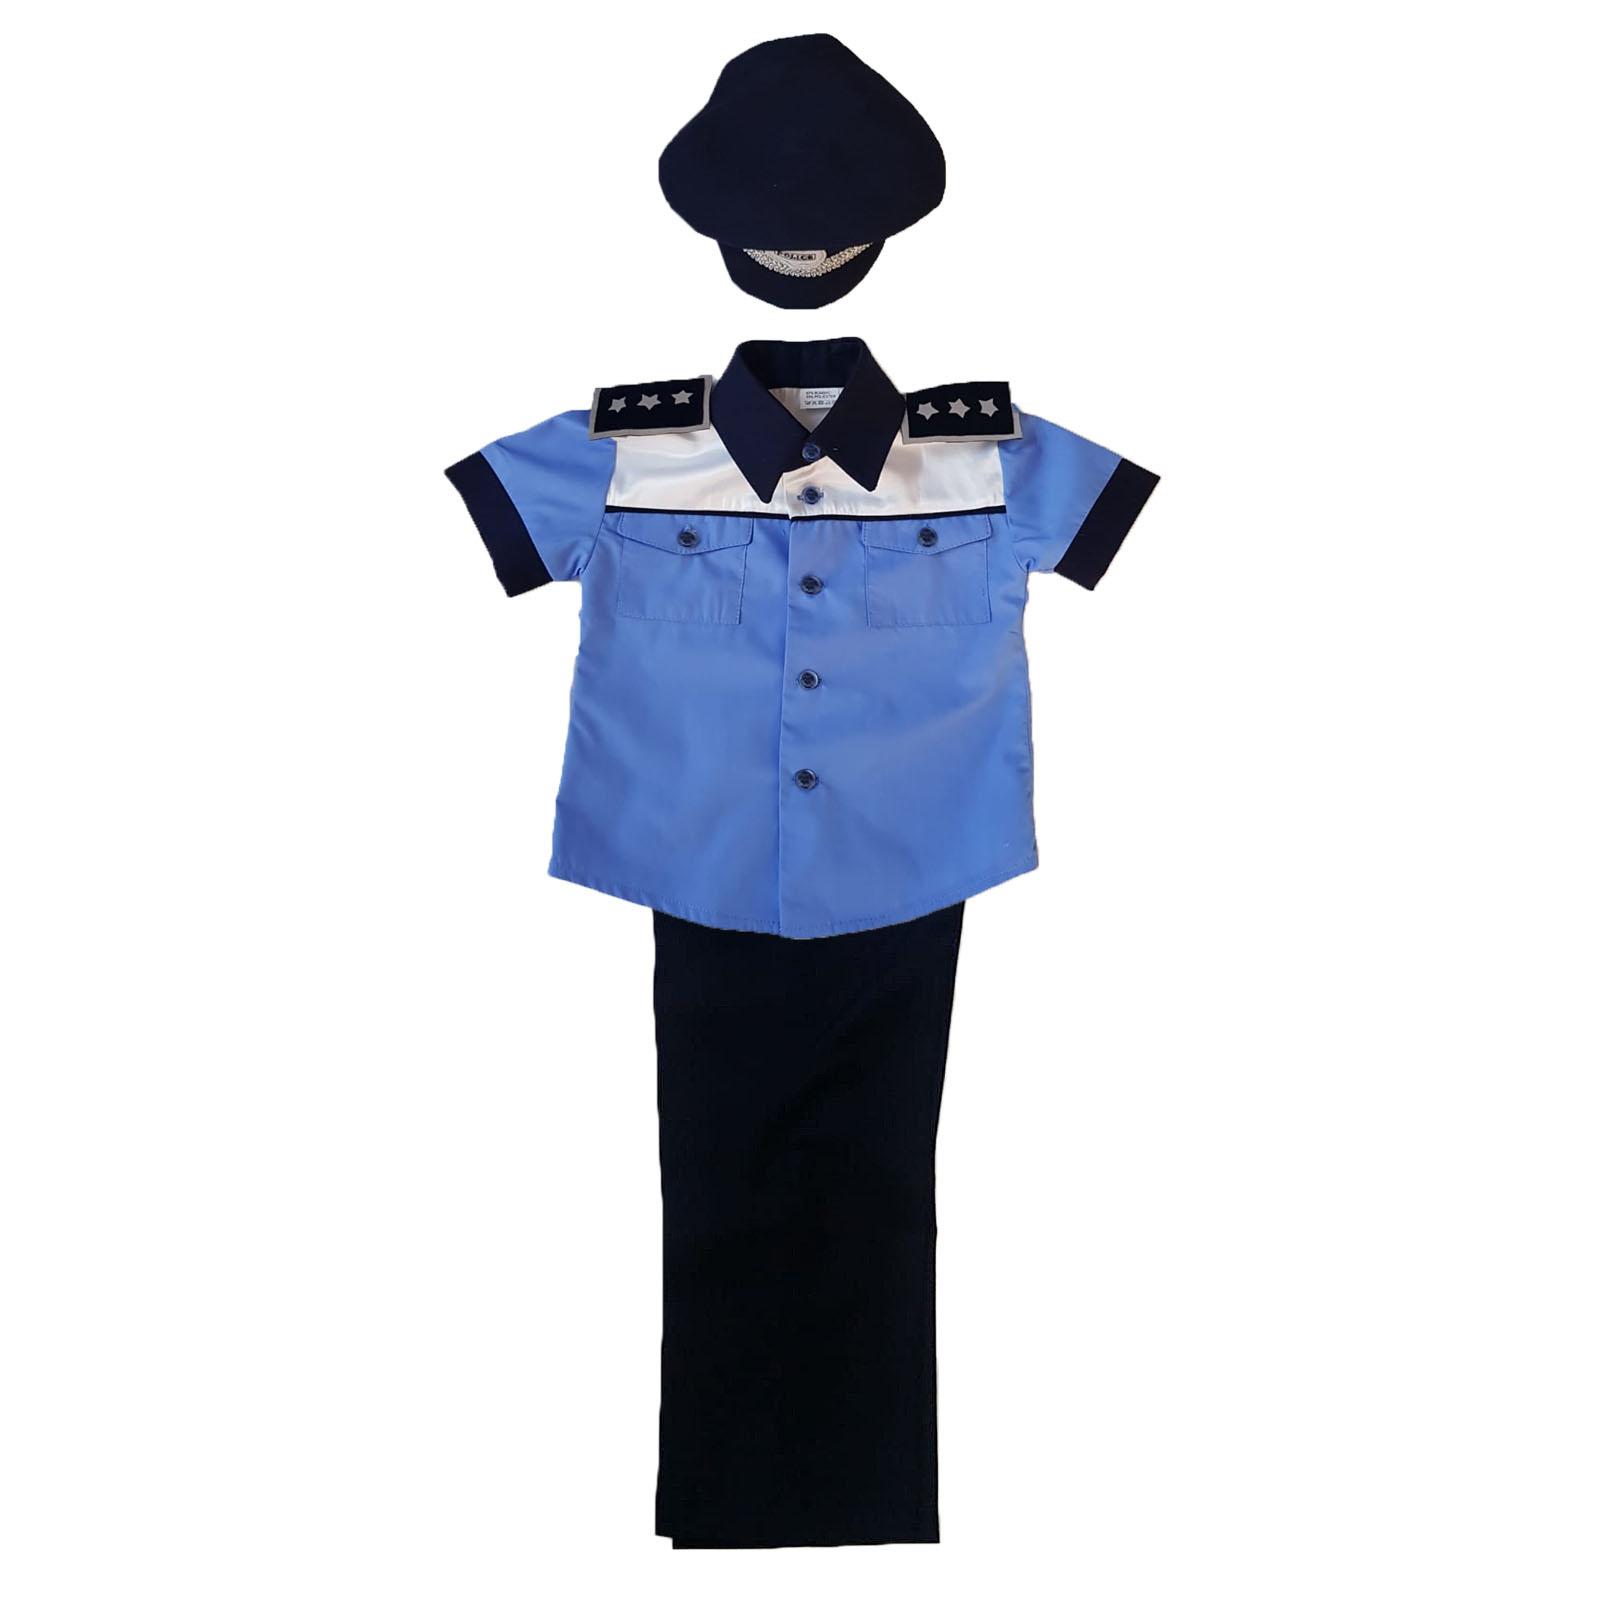 Costum polițist cu grade